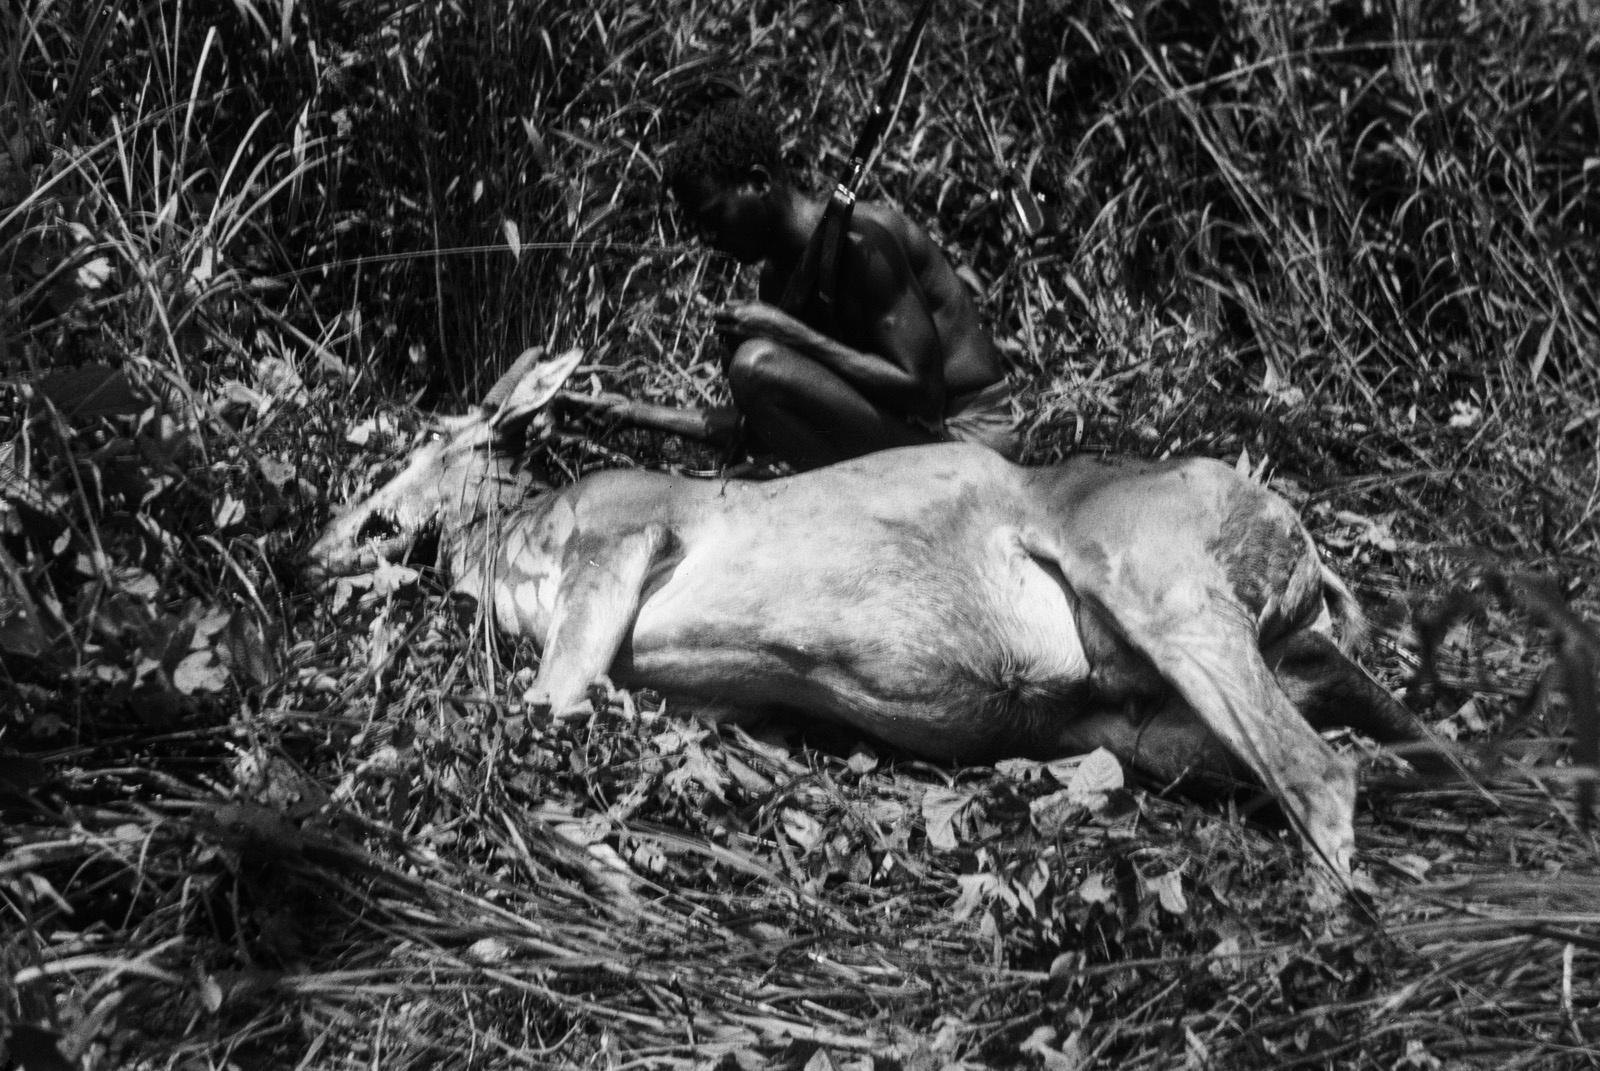 Между Капири Мпоши и рекой Лунсемфва. Убитая антилопа канна